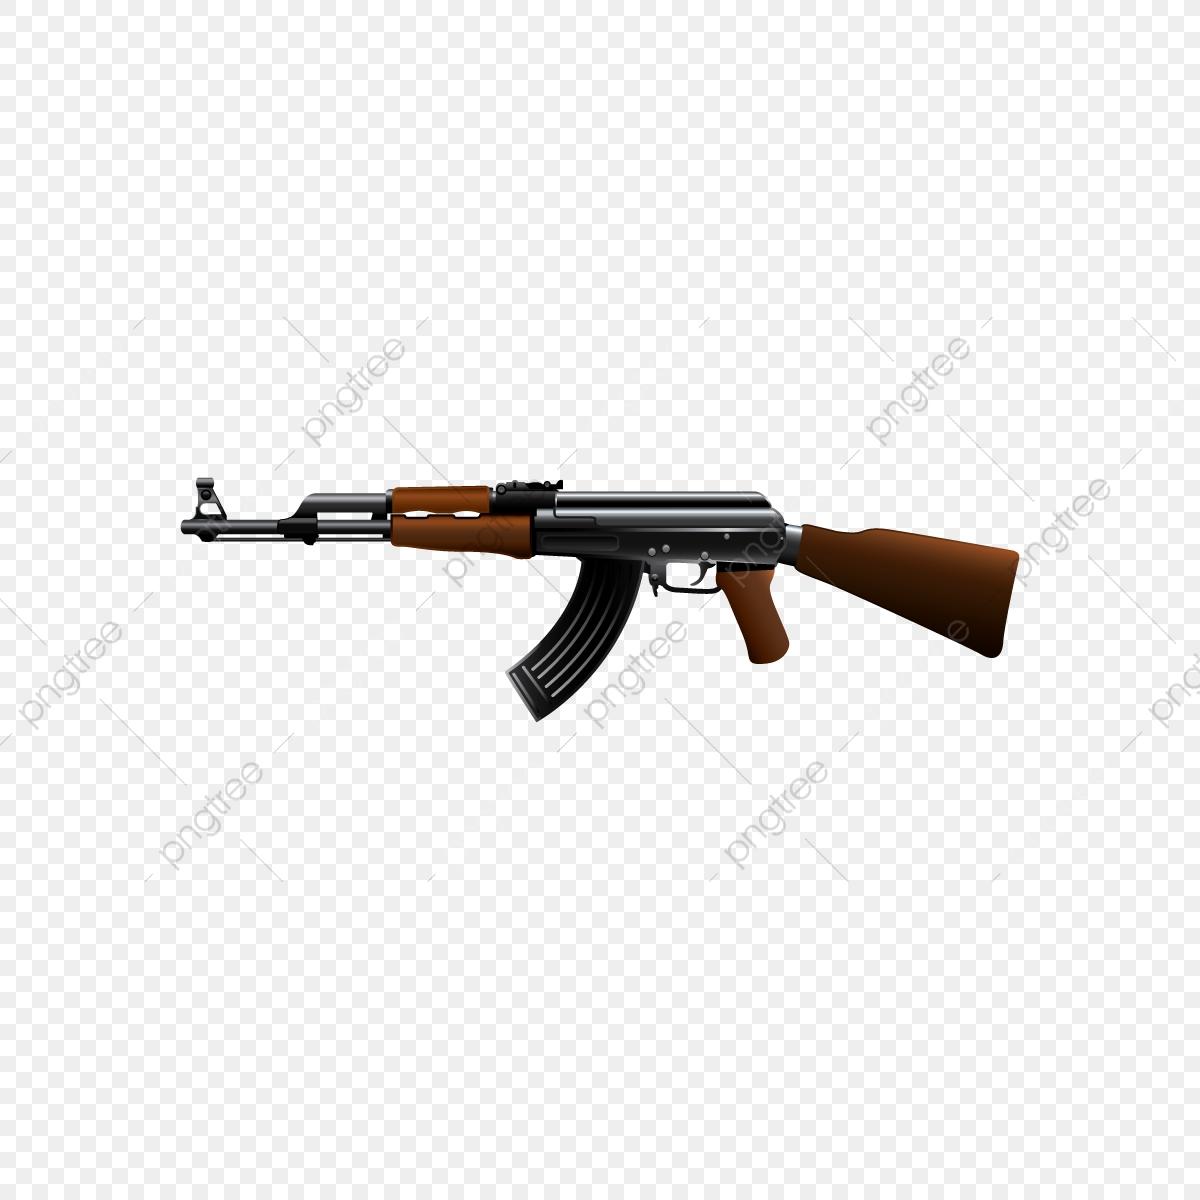 Ak47 Guns Ak47 47 Gun Png Transparent Clipart Image And